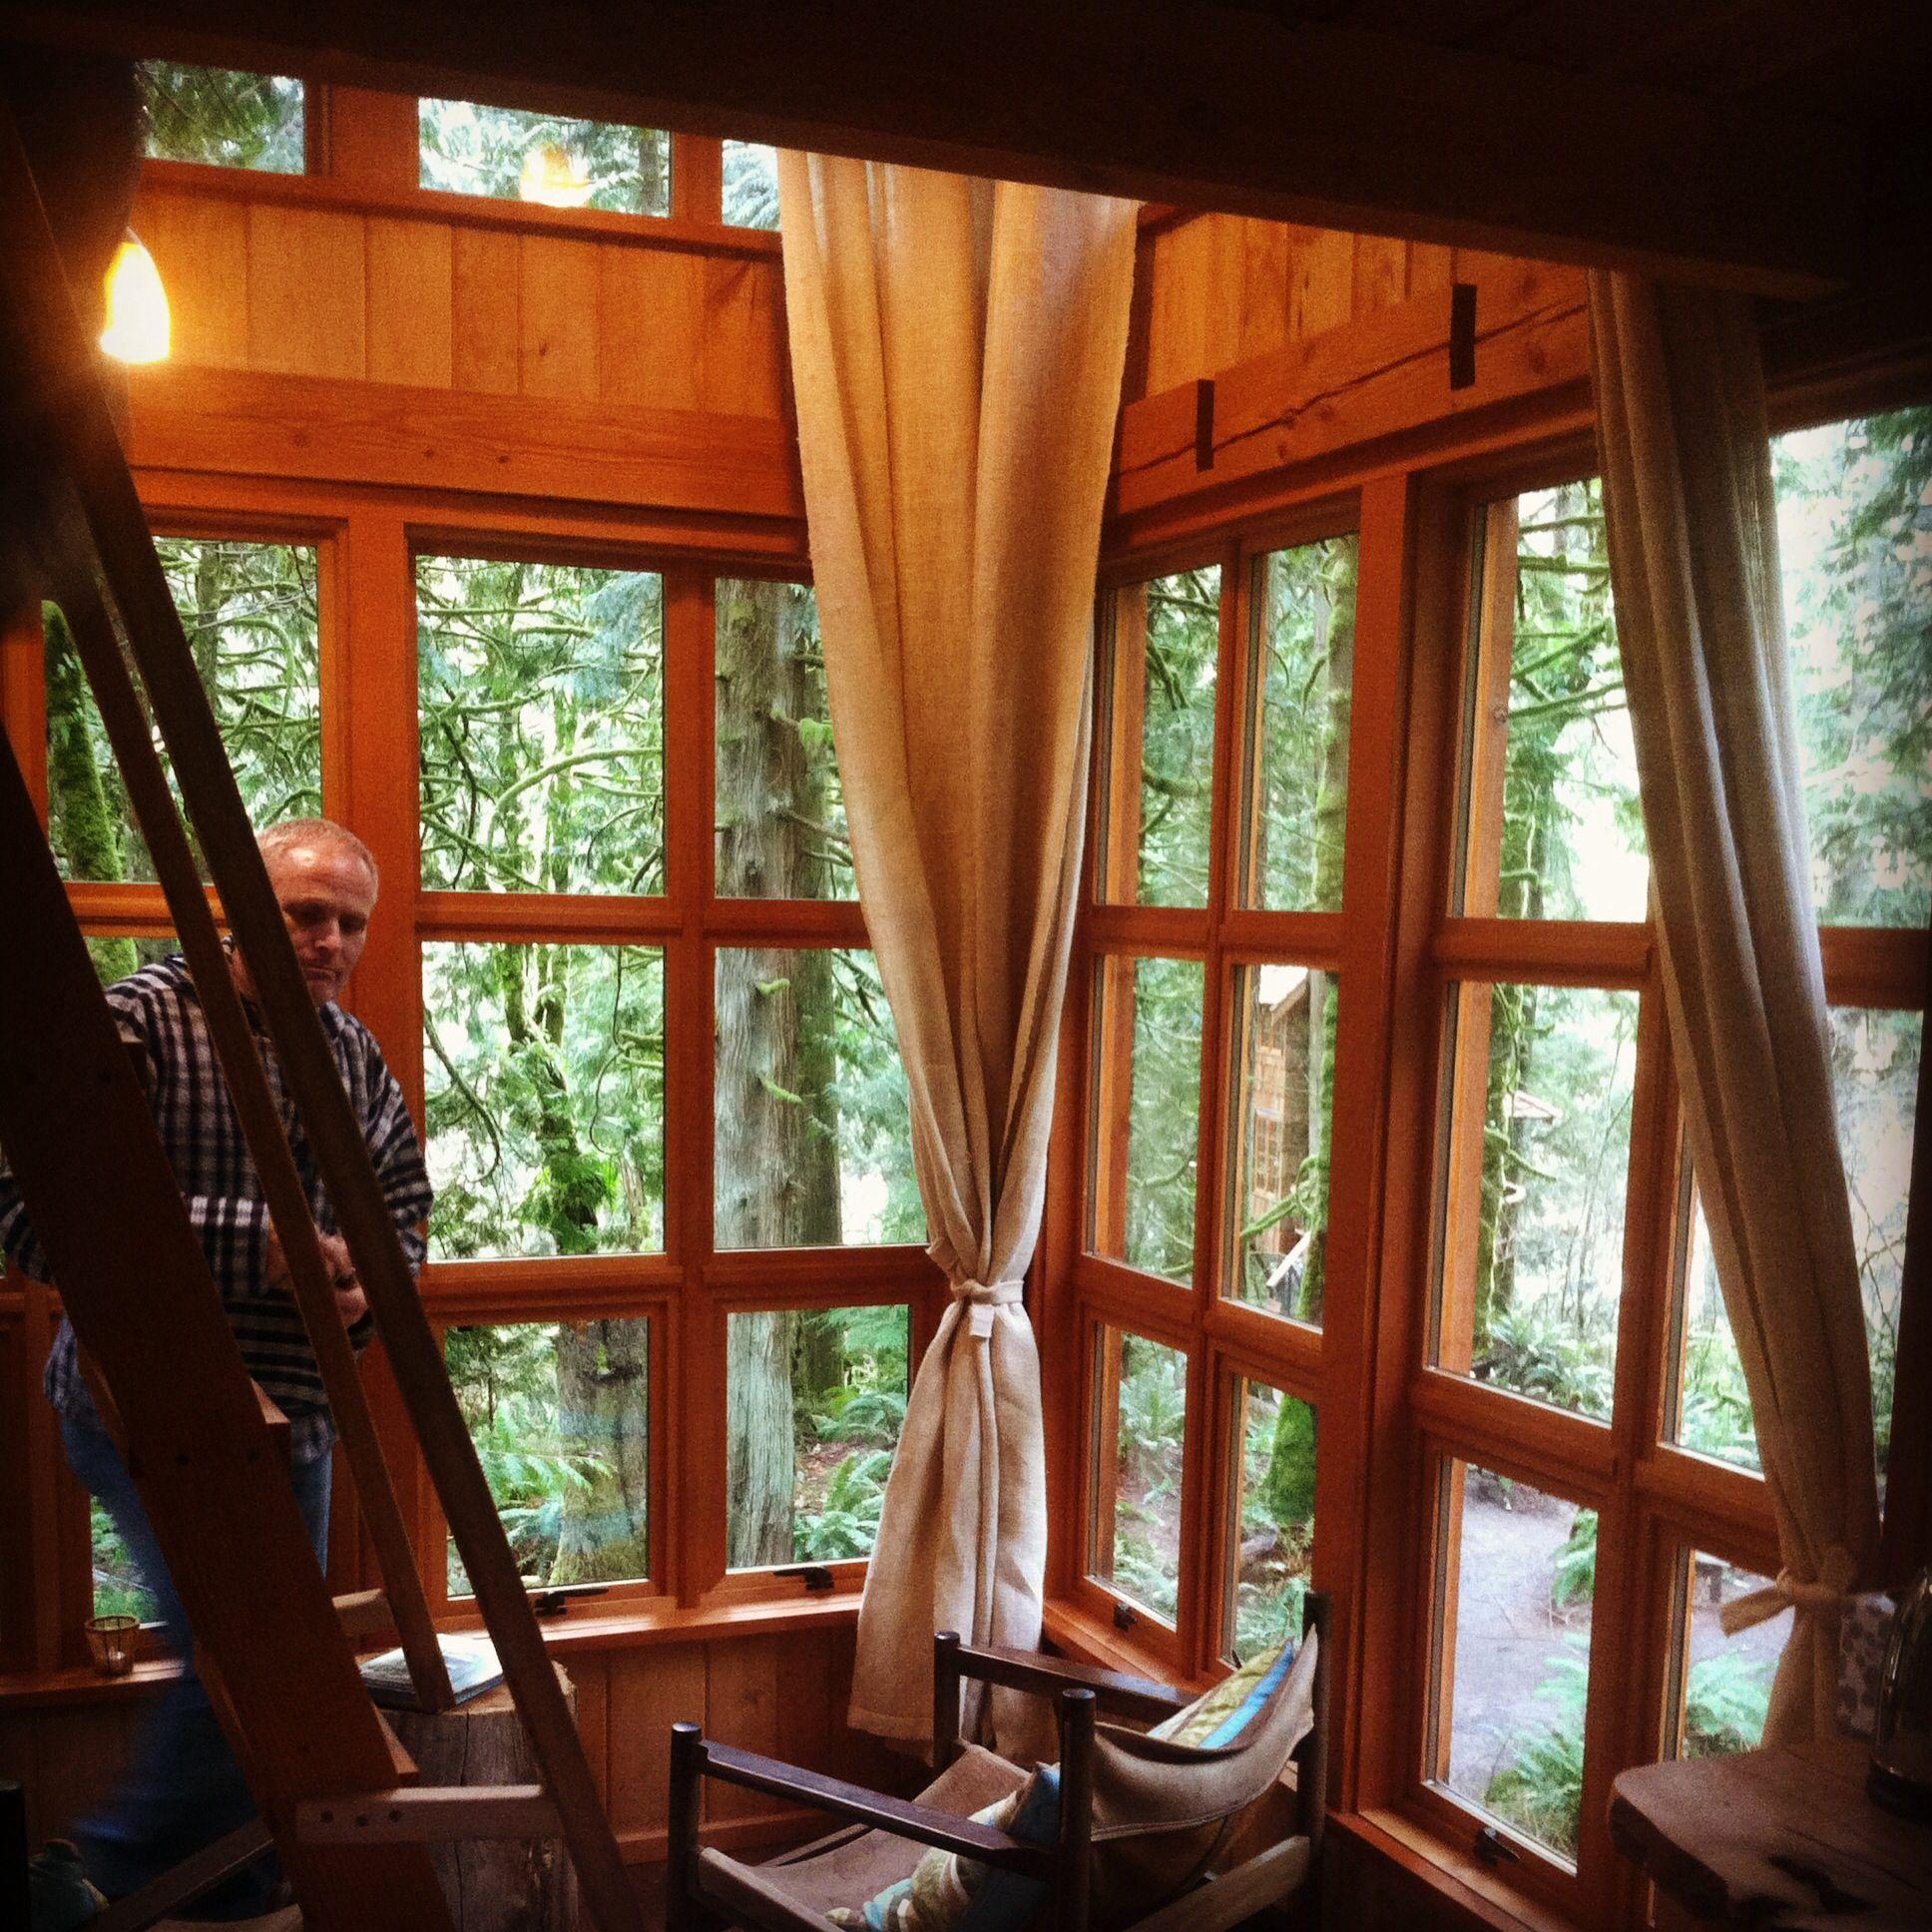 Treehouse Fall City Wa Part - 30: Inside Trillium Treehouse, Treehouse Point Fall City Washington #treehouse  #fallcity #washington #